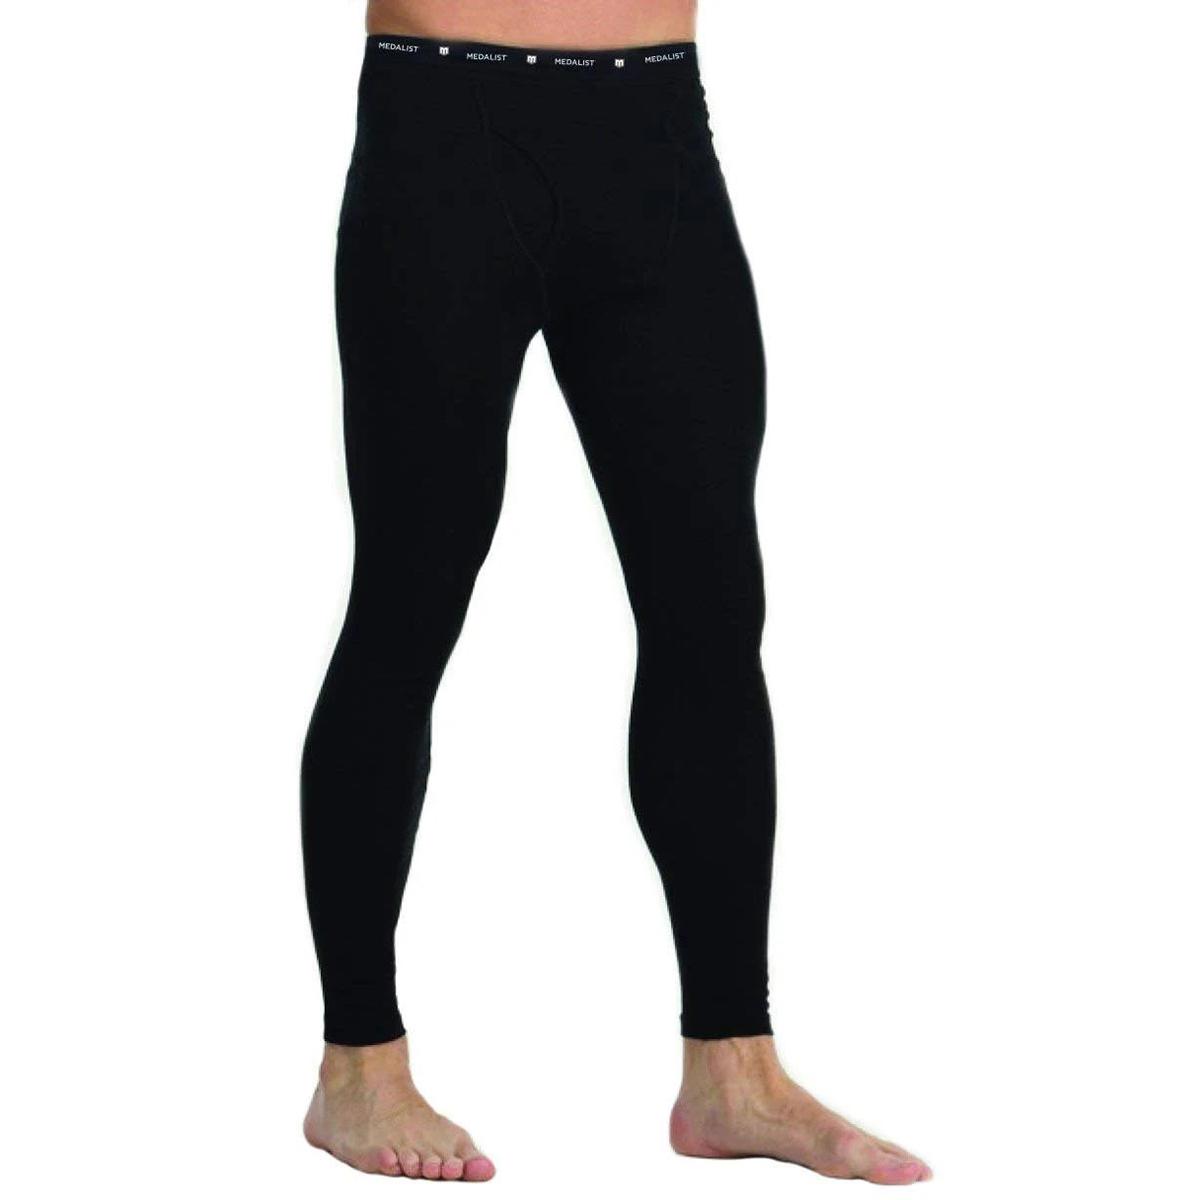 Medalist Men's Performance Fleece Base Layer Pants - Black, L